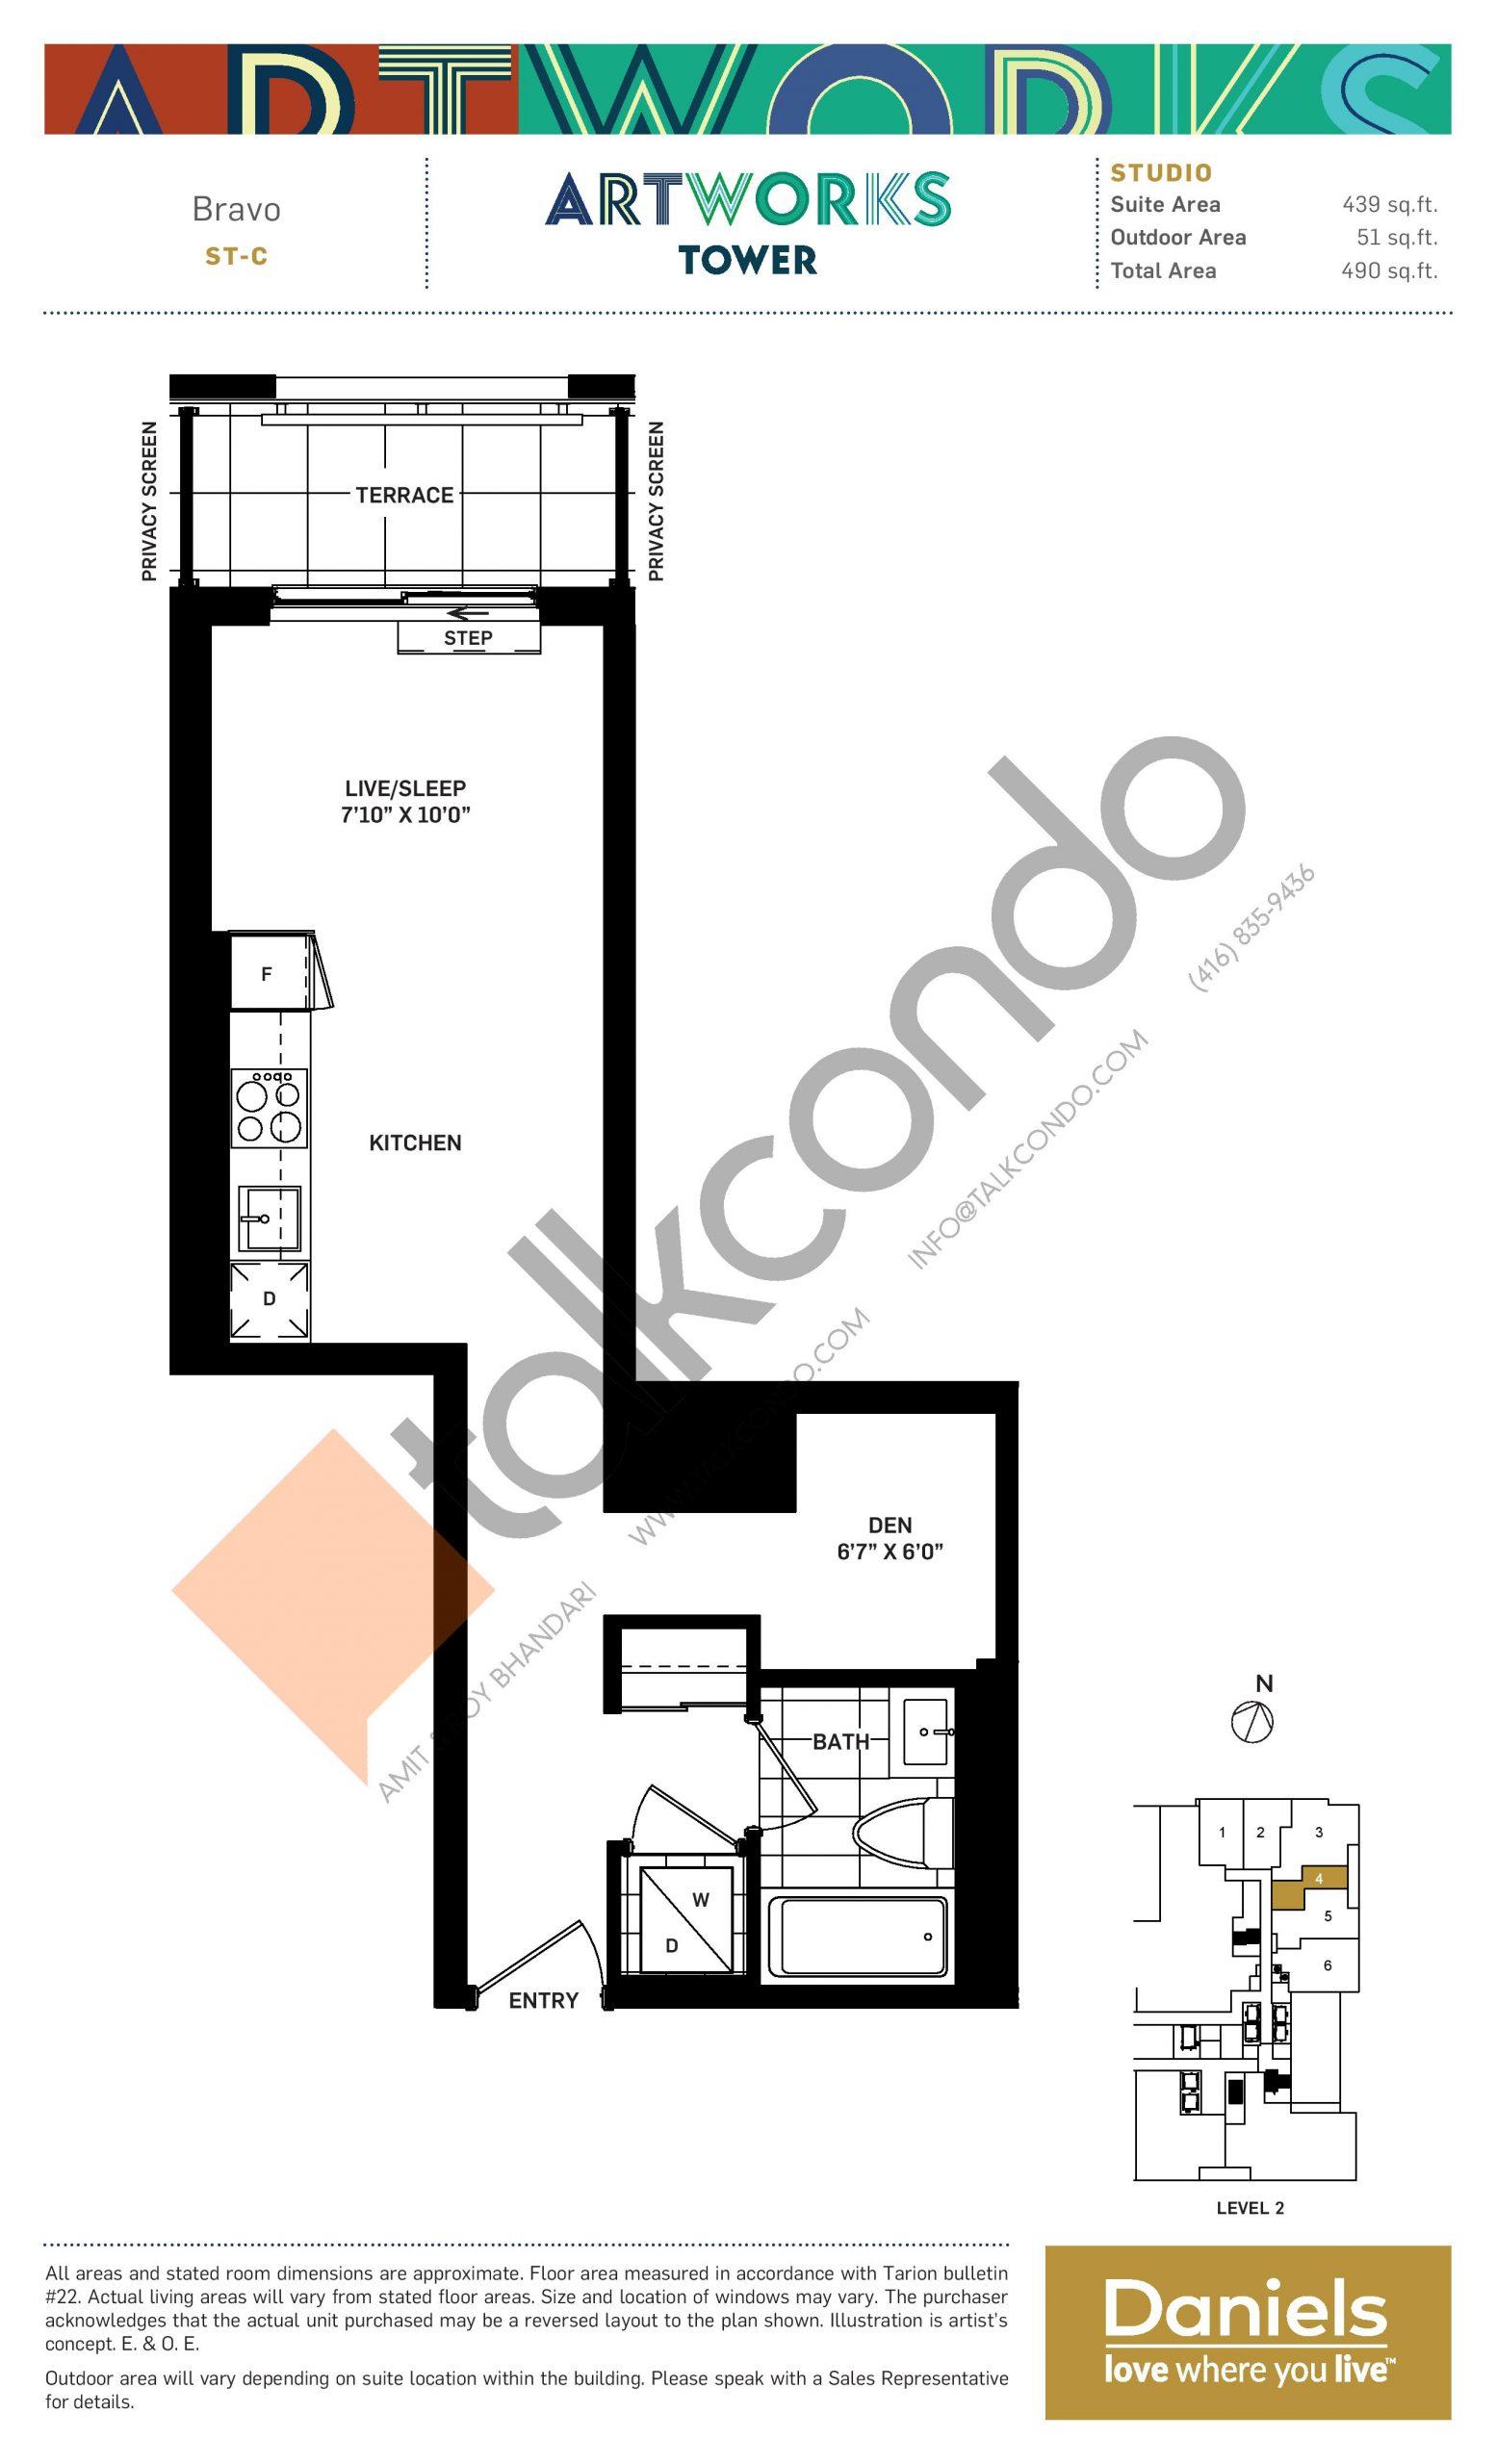 Bravo Floor Plan at Artworks Tower Condos - 439 sq.ft